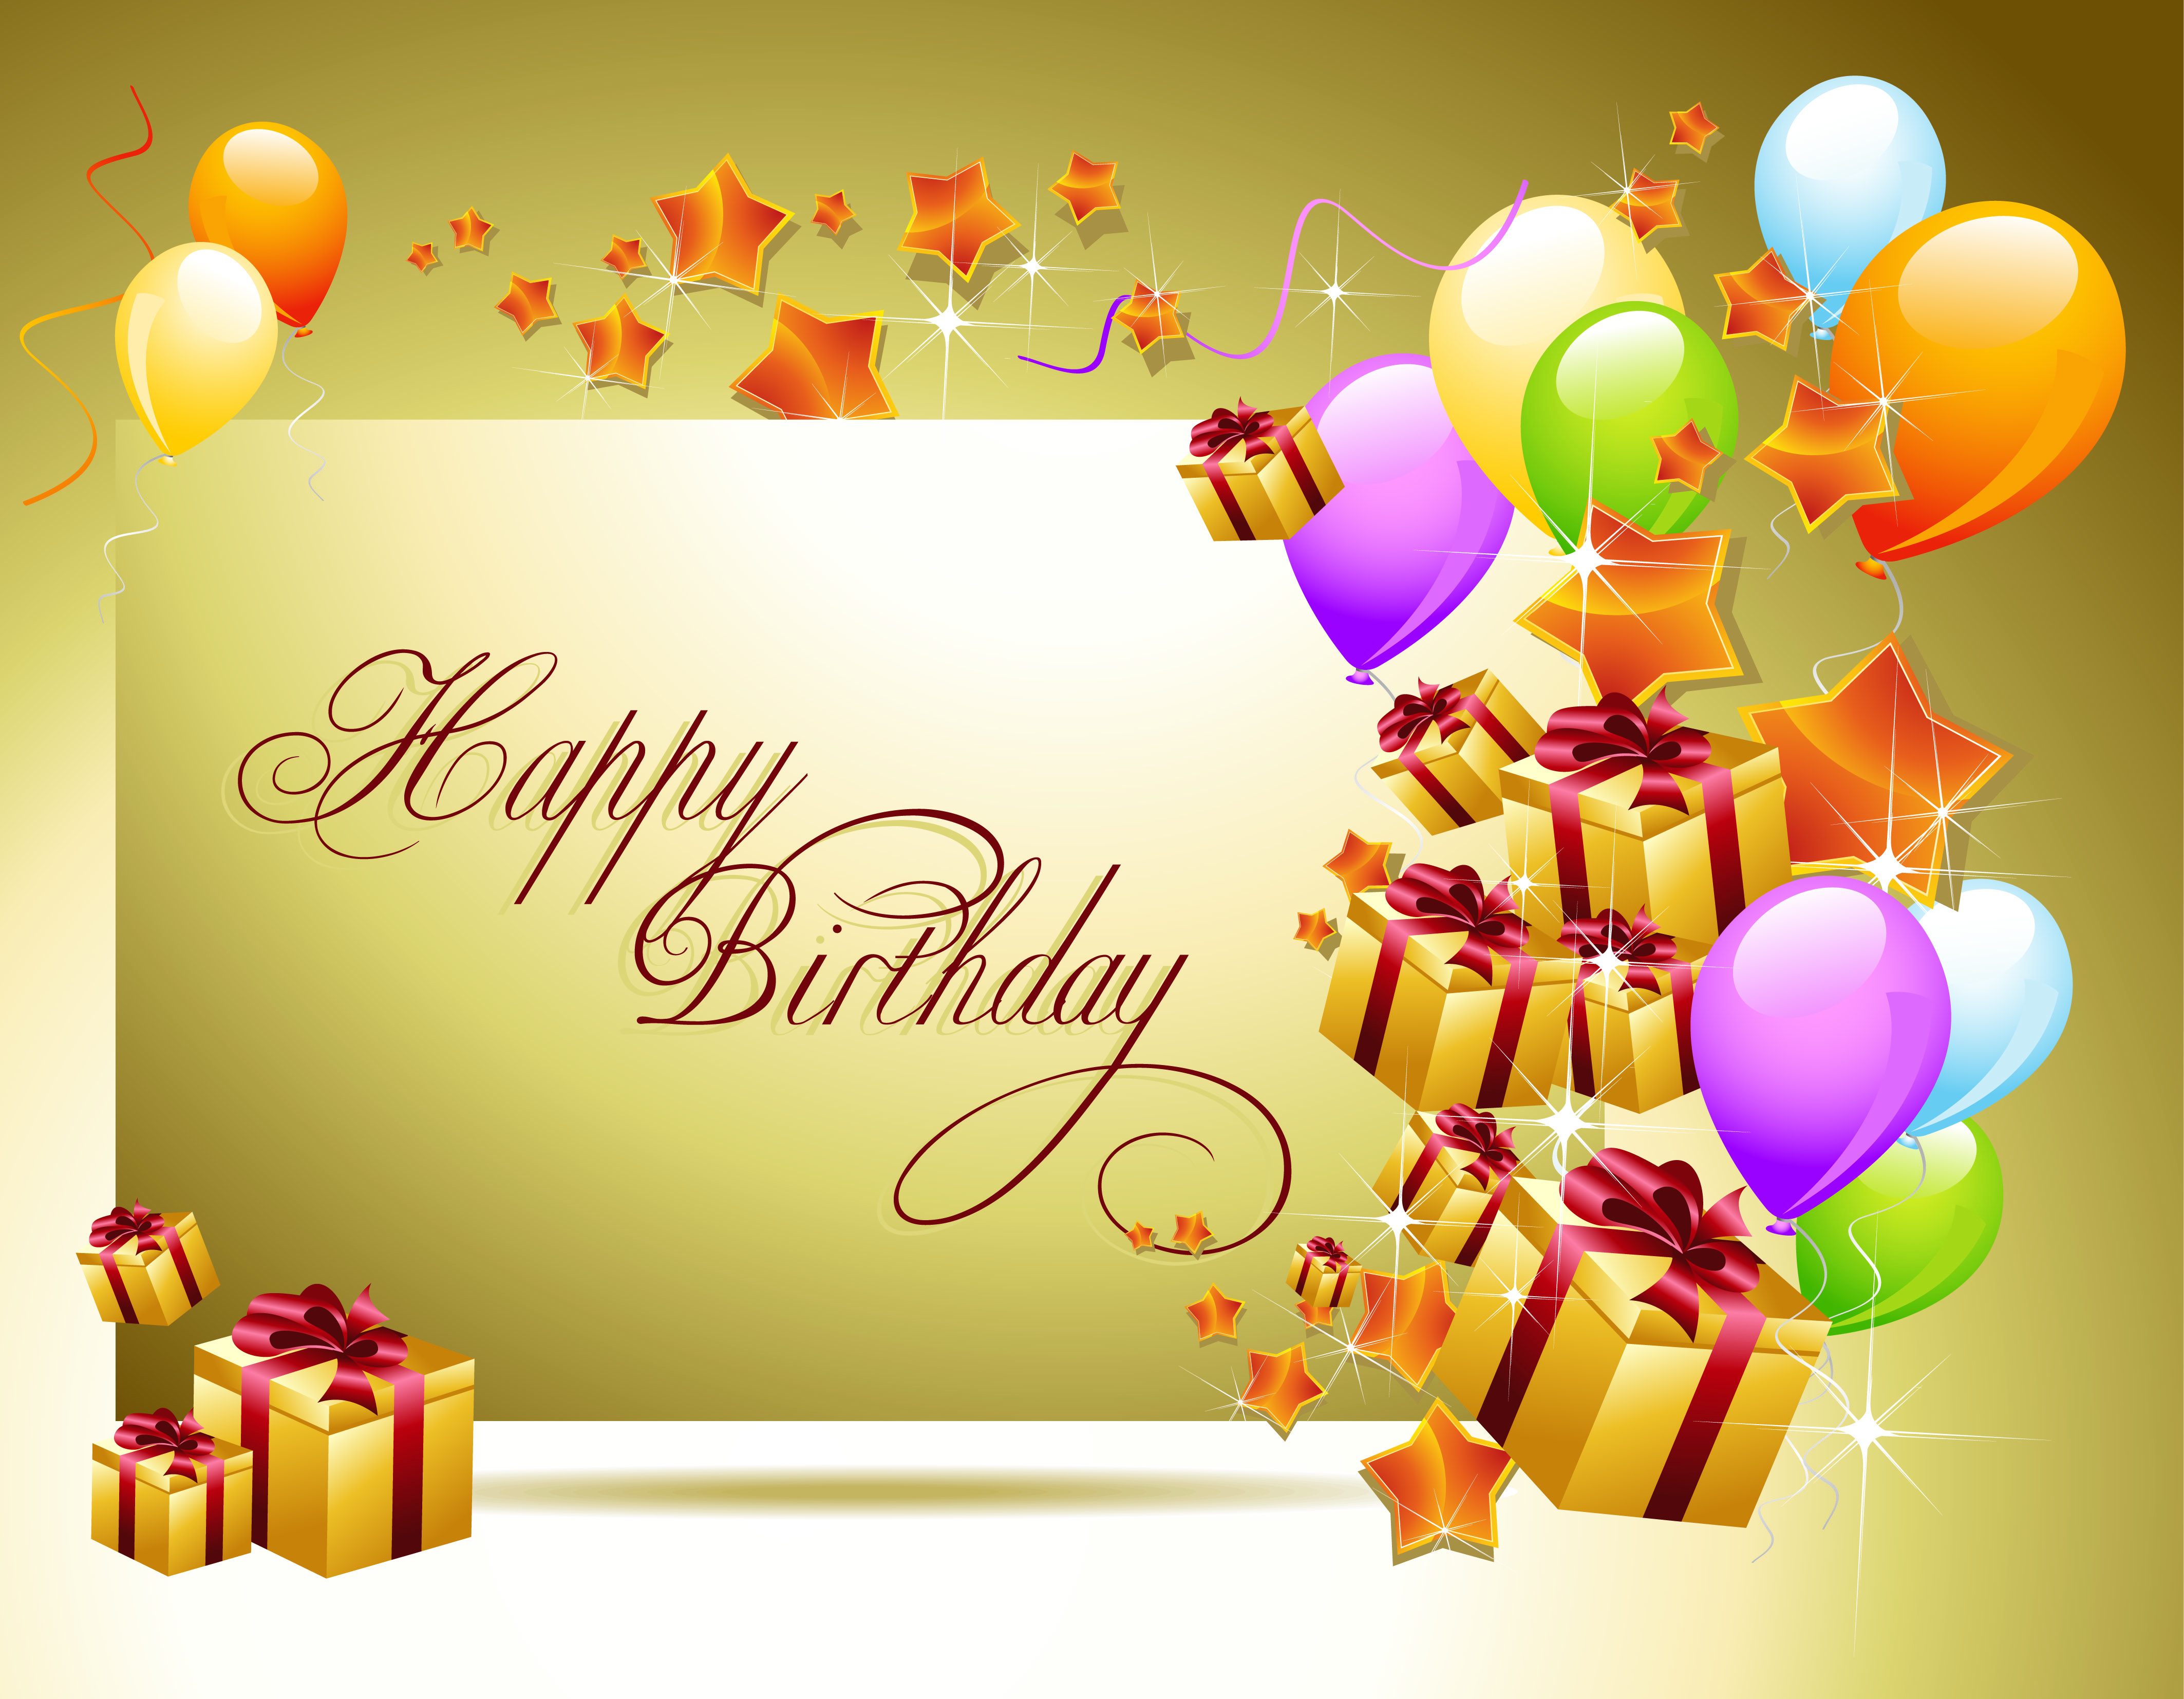 Happy Birthday Cake Whatsapp dp Images Photos Pictures 4252x3307